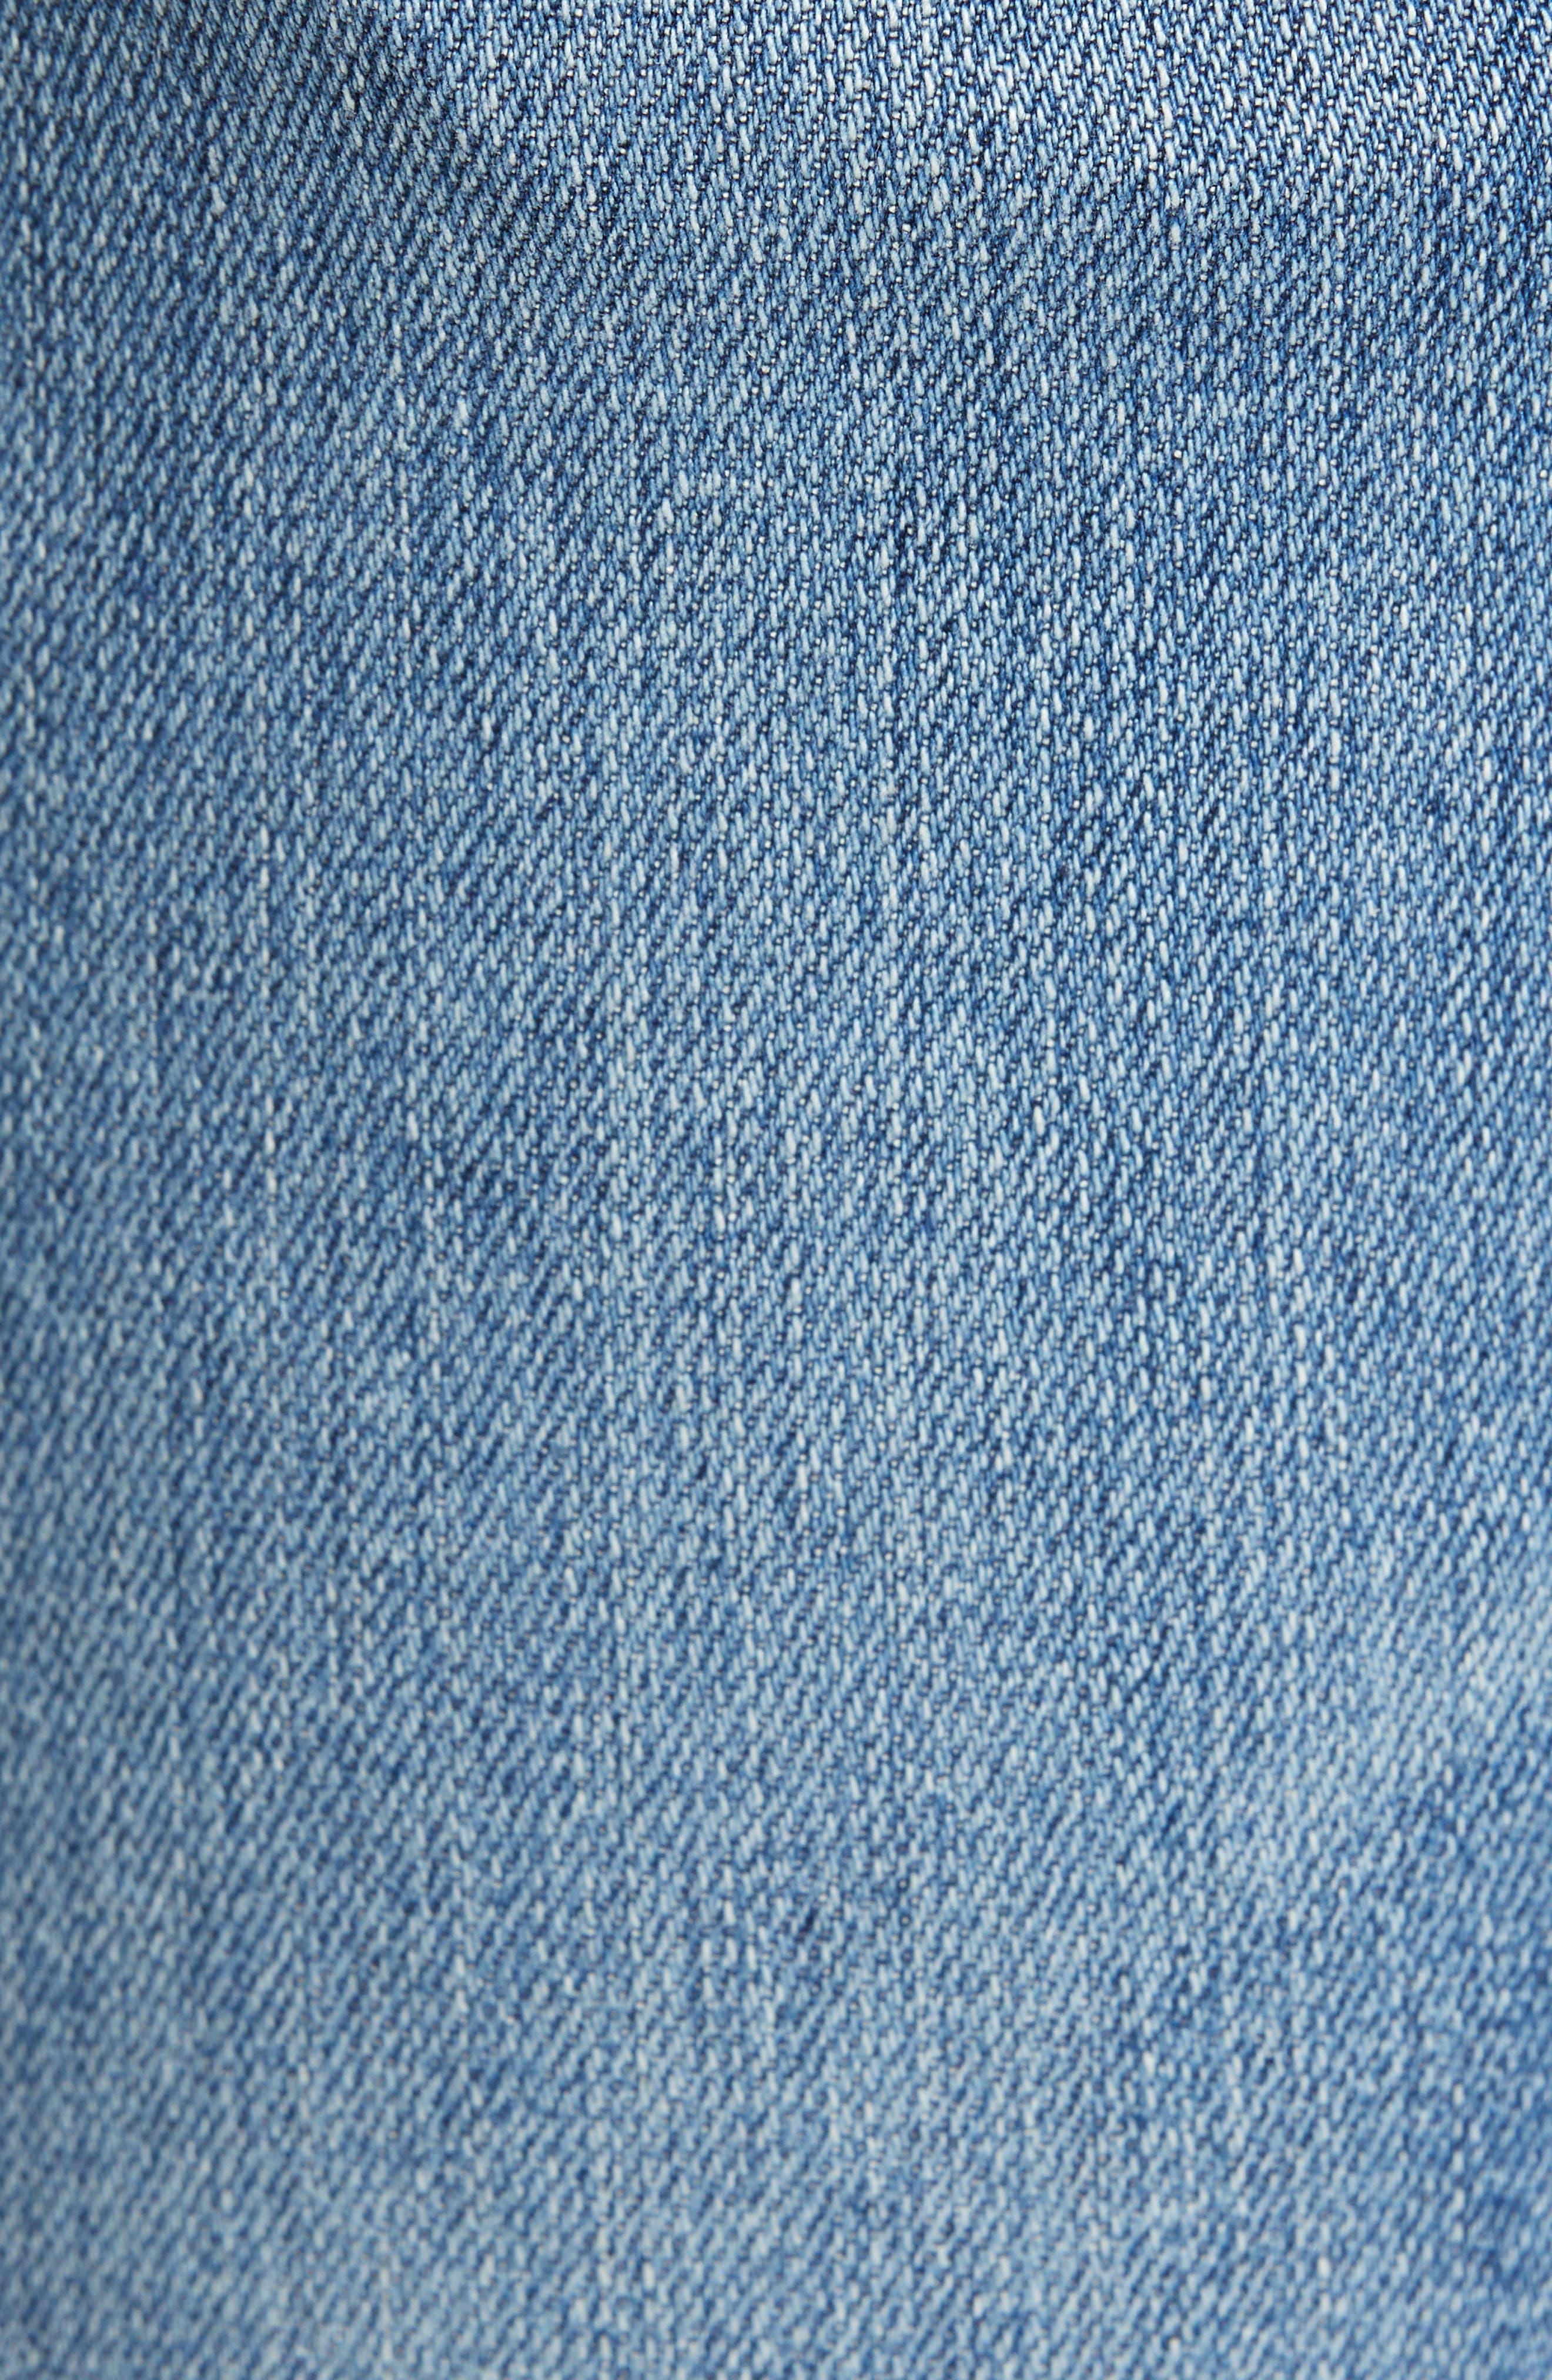 Tellis Slim Fit Jeans,                             Alternate thumbnail 5, color,                             16 YEARS EAVES